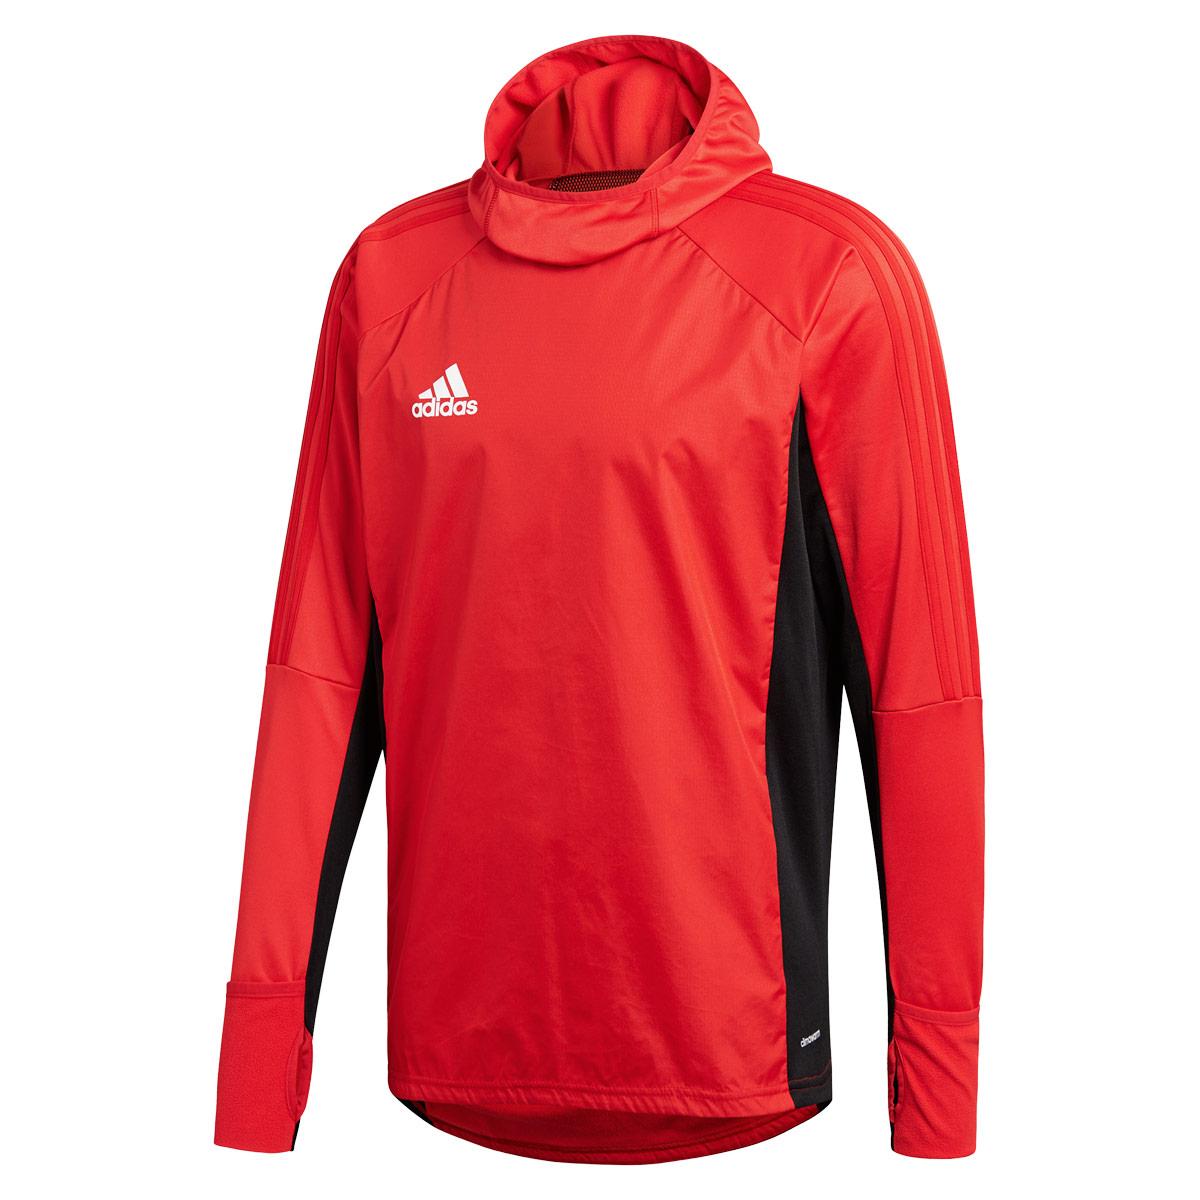 Adidas Warm Pour 17 Sweats Pulls Tiro Homme Rouge Shirt odCxerB